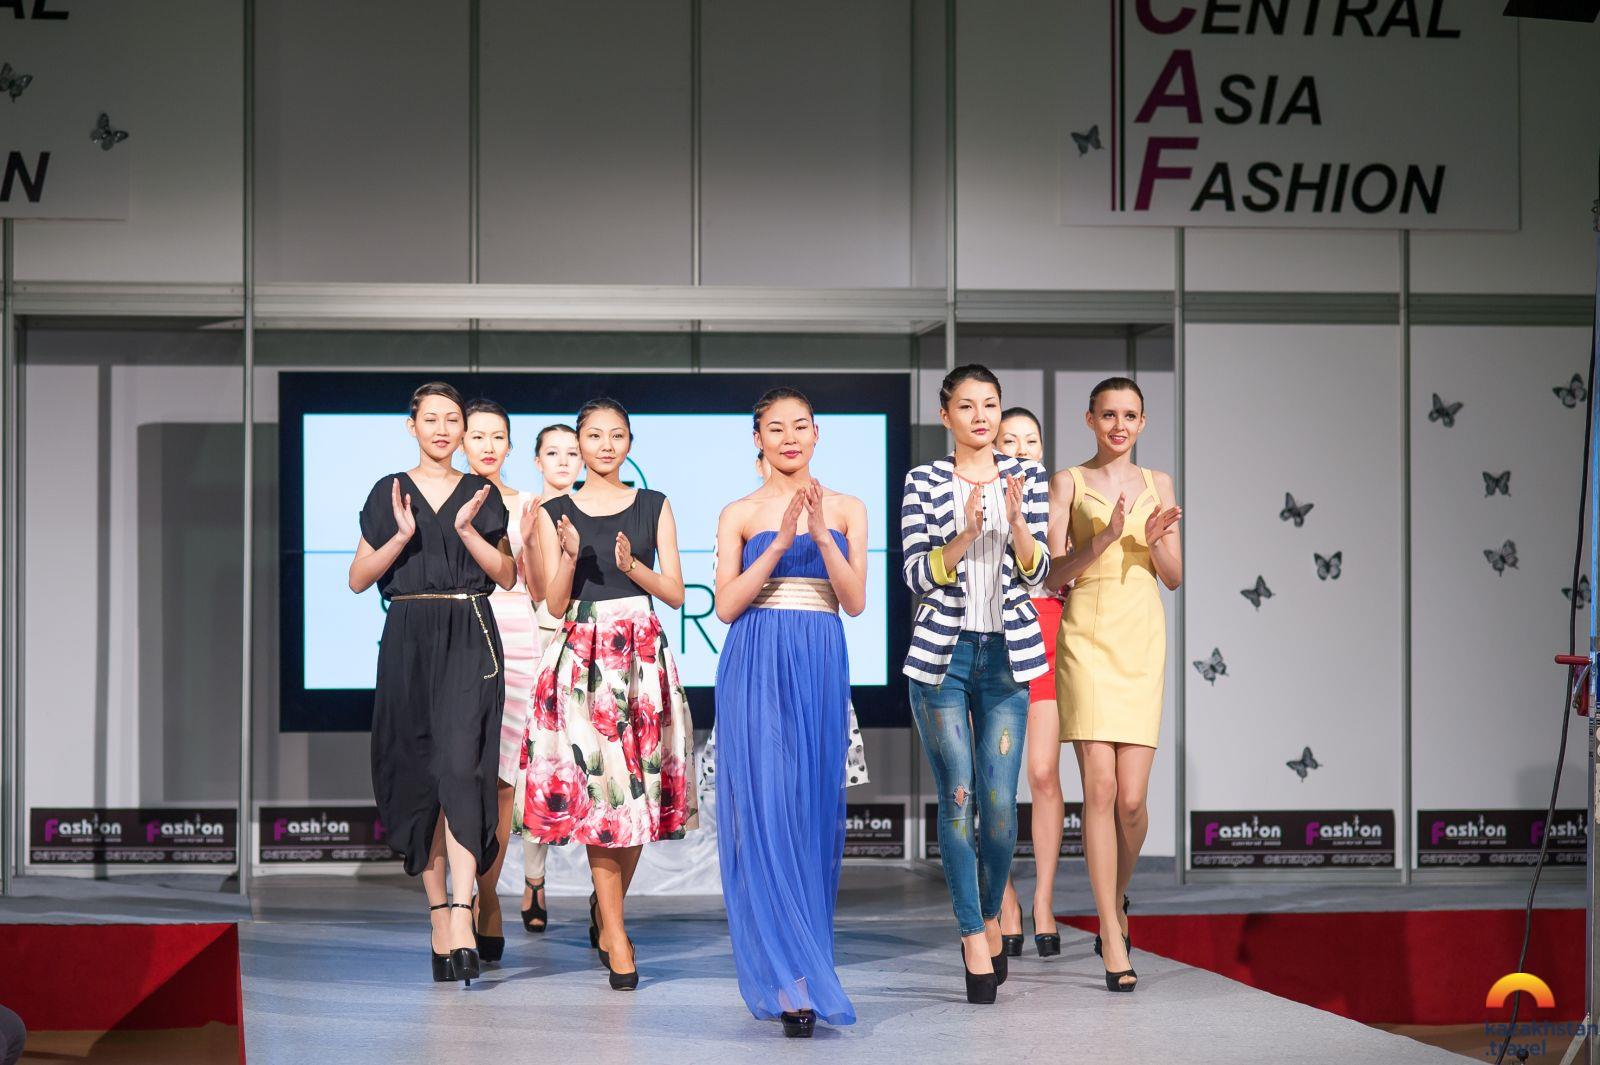 Международная выставка моды Central Asia Fashion Autumn 2020